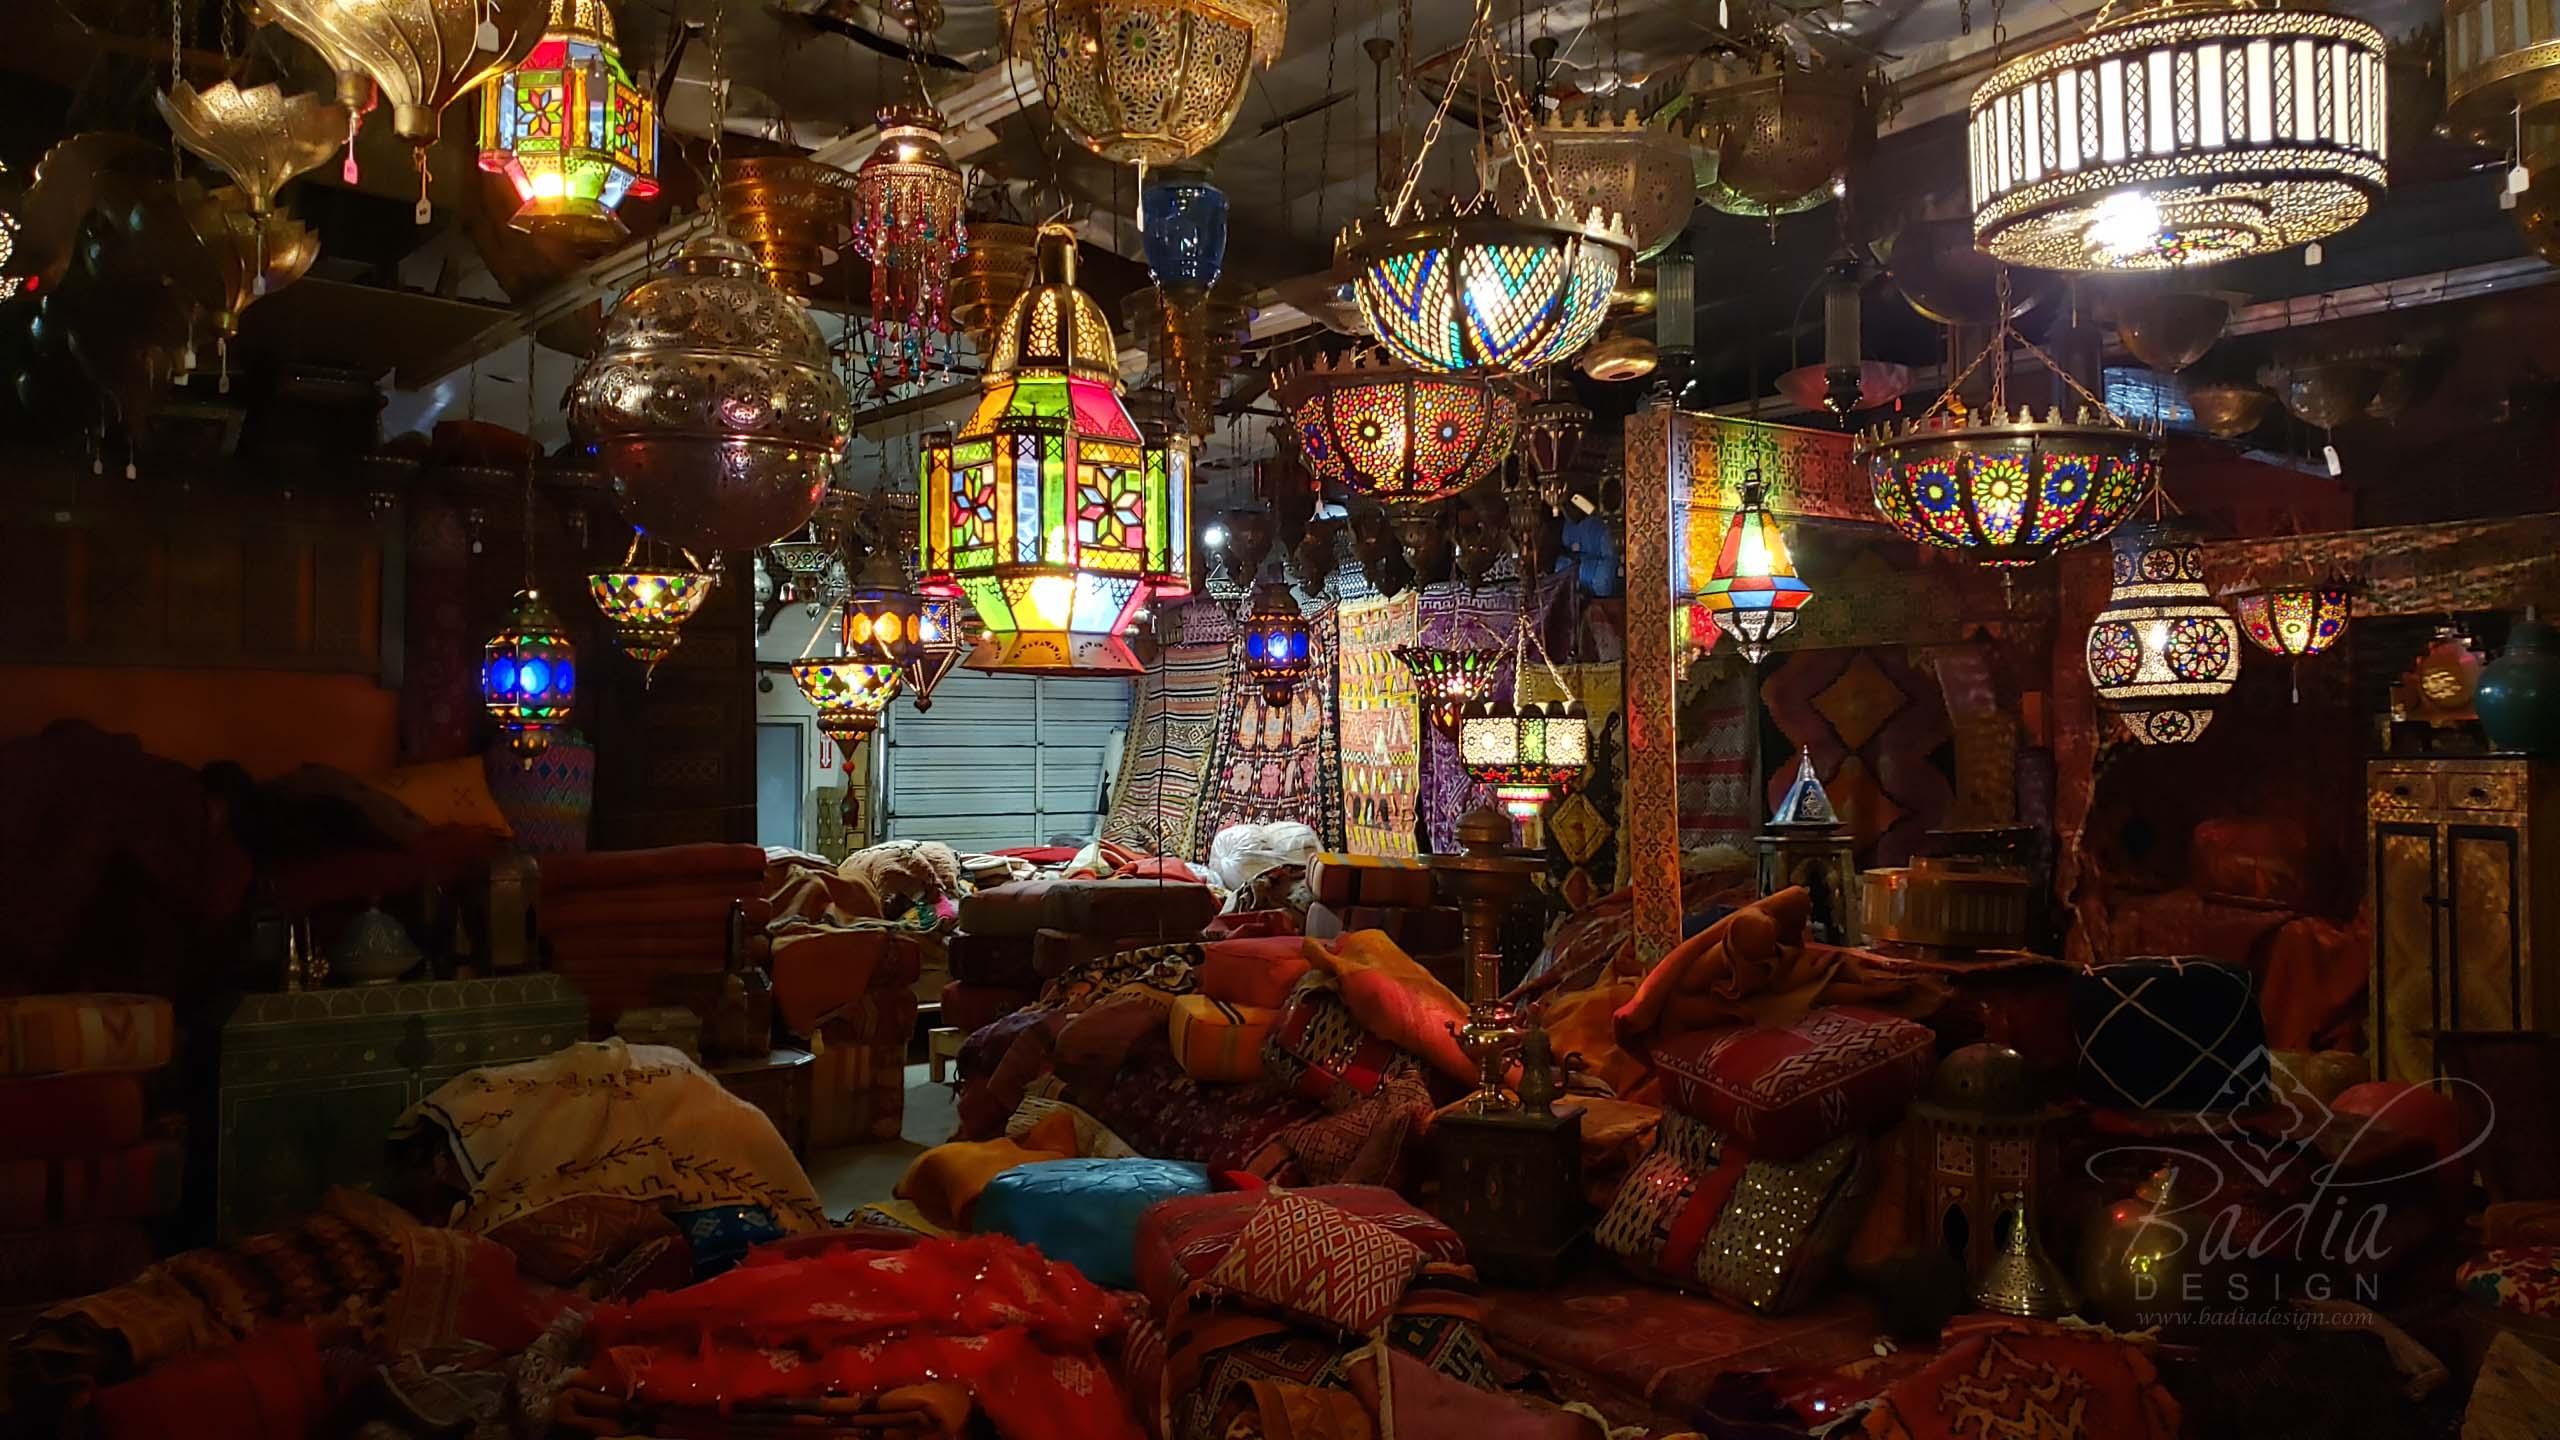 moroccan-party-rental-badia-design.jpg